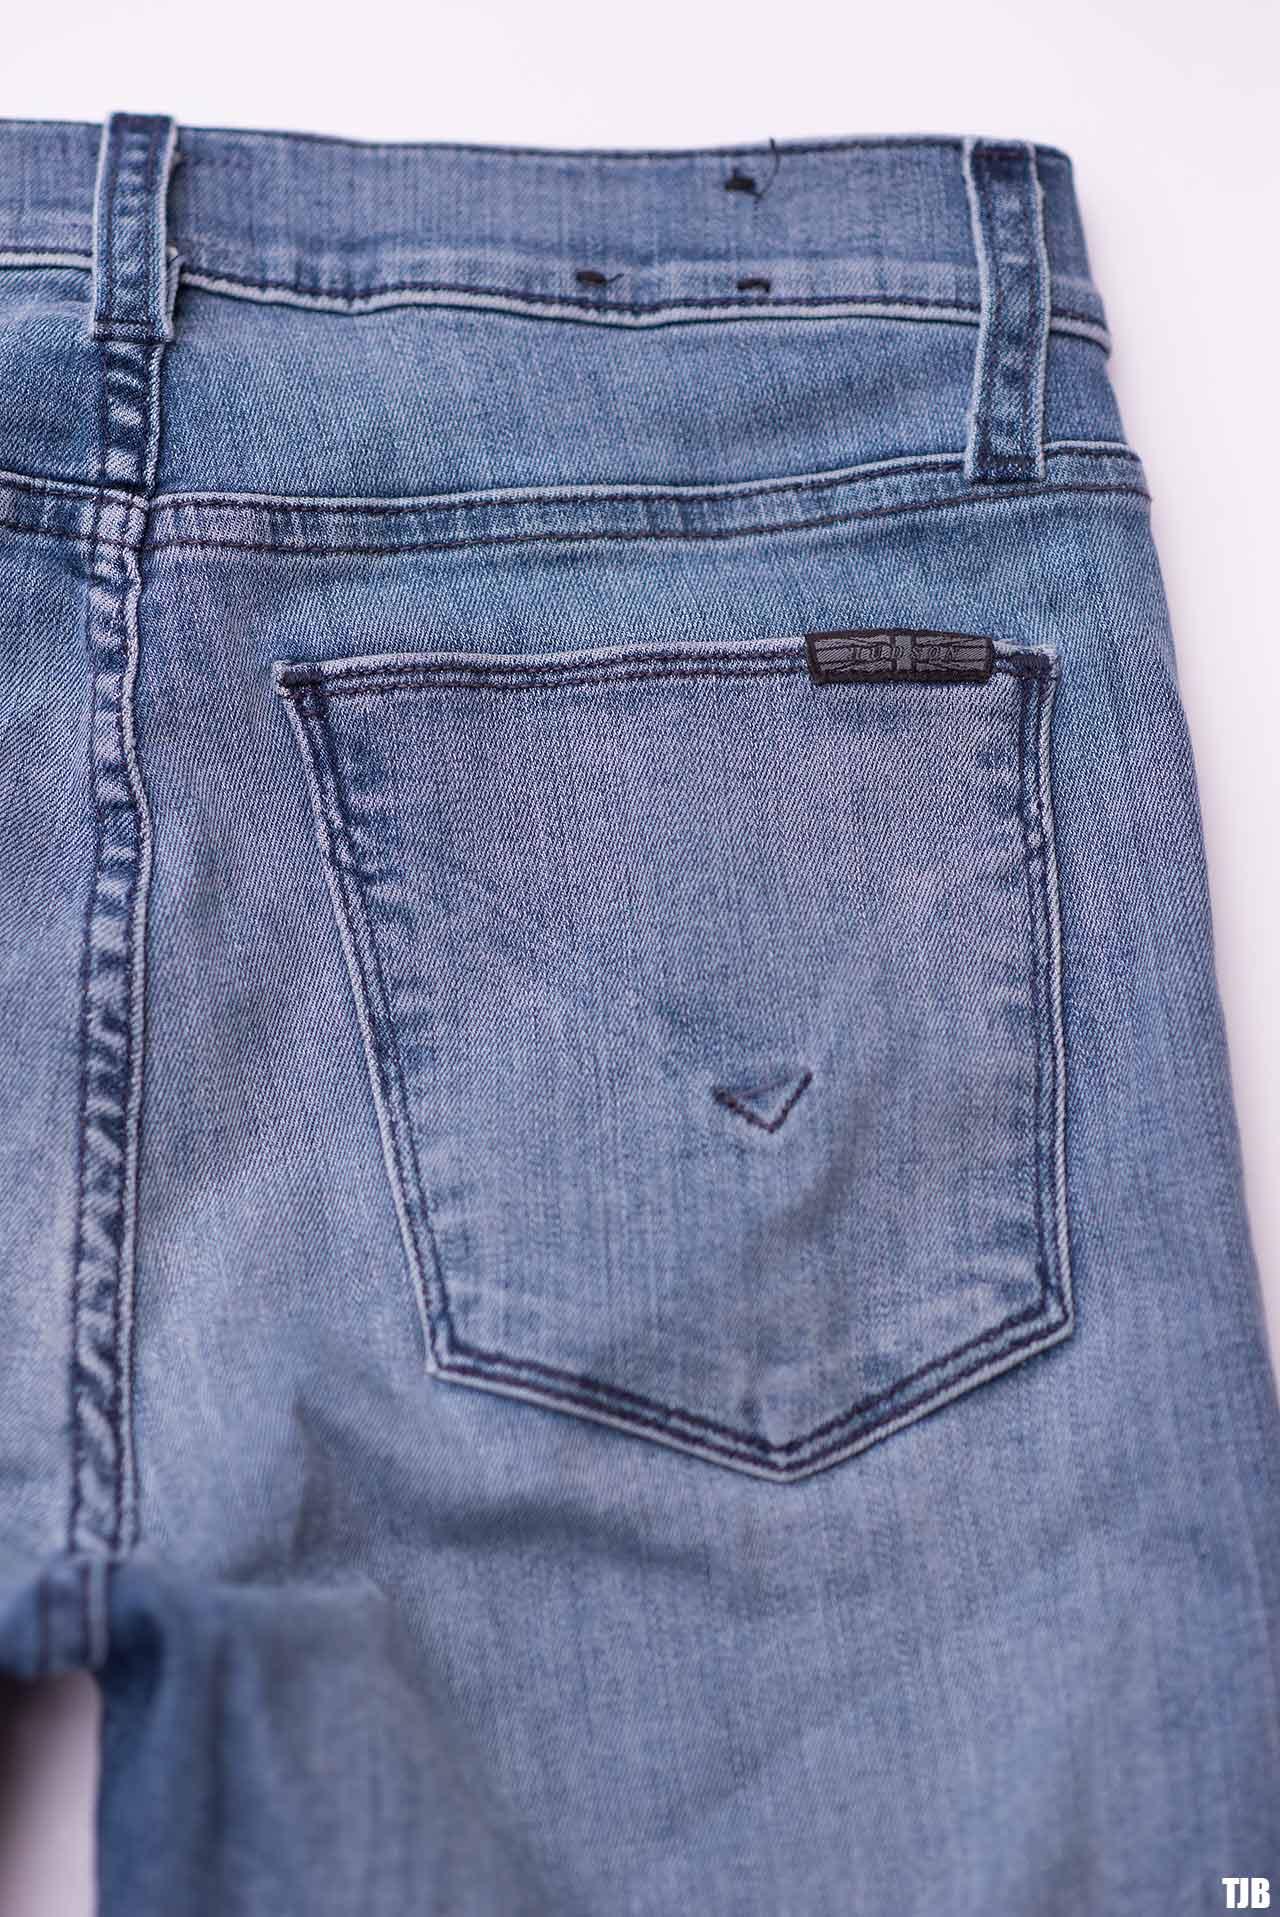 hudson-jeans-barbara-high-waist-hideaway-review-5